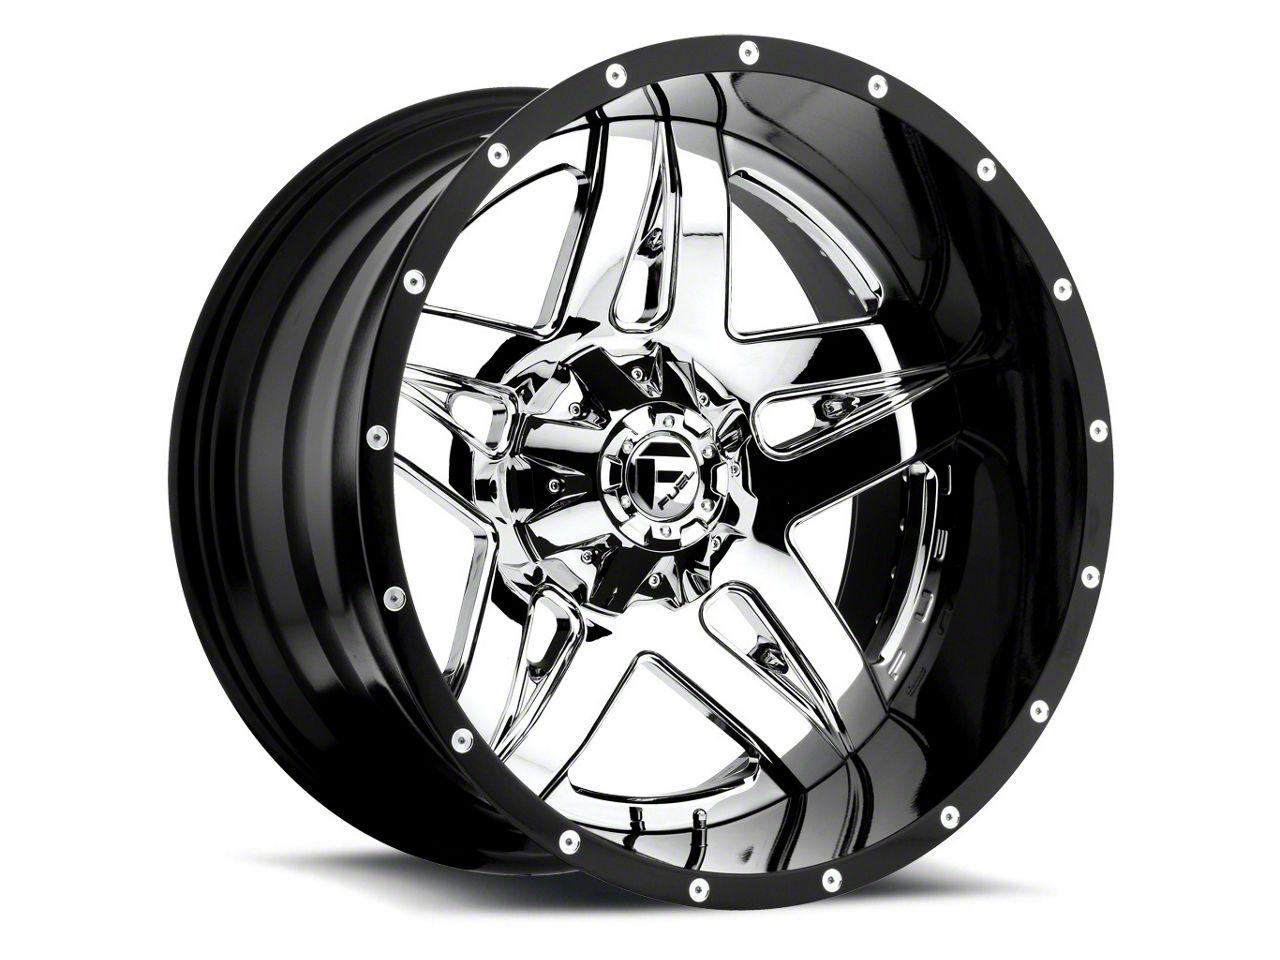 Fuel Wheels Full Blown Chrome 6-Lug Wheel - 20x10 (99-18 Silverado 1500)